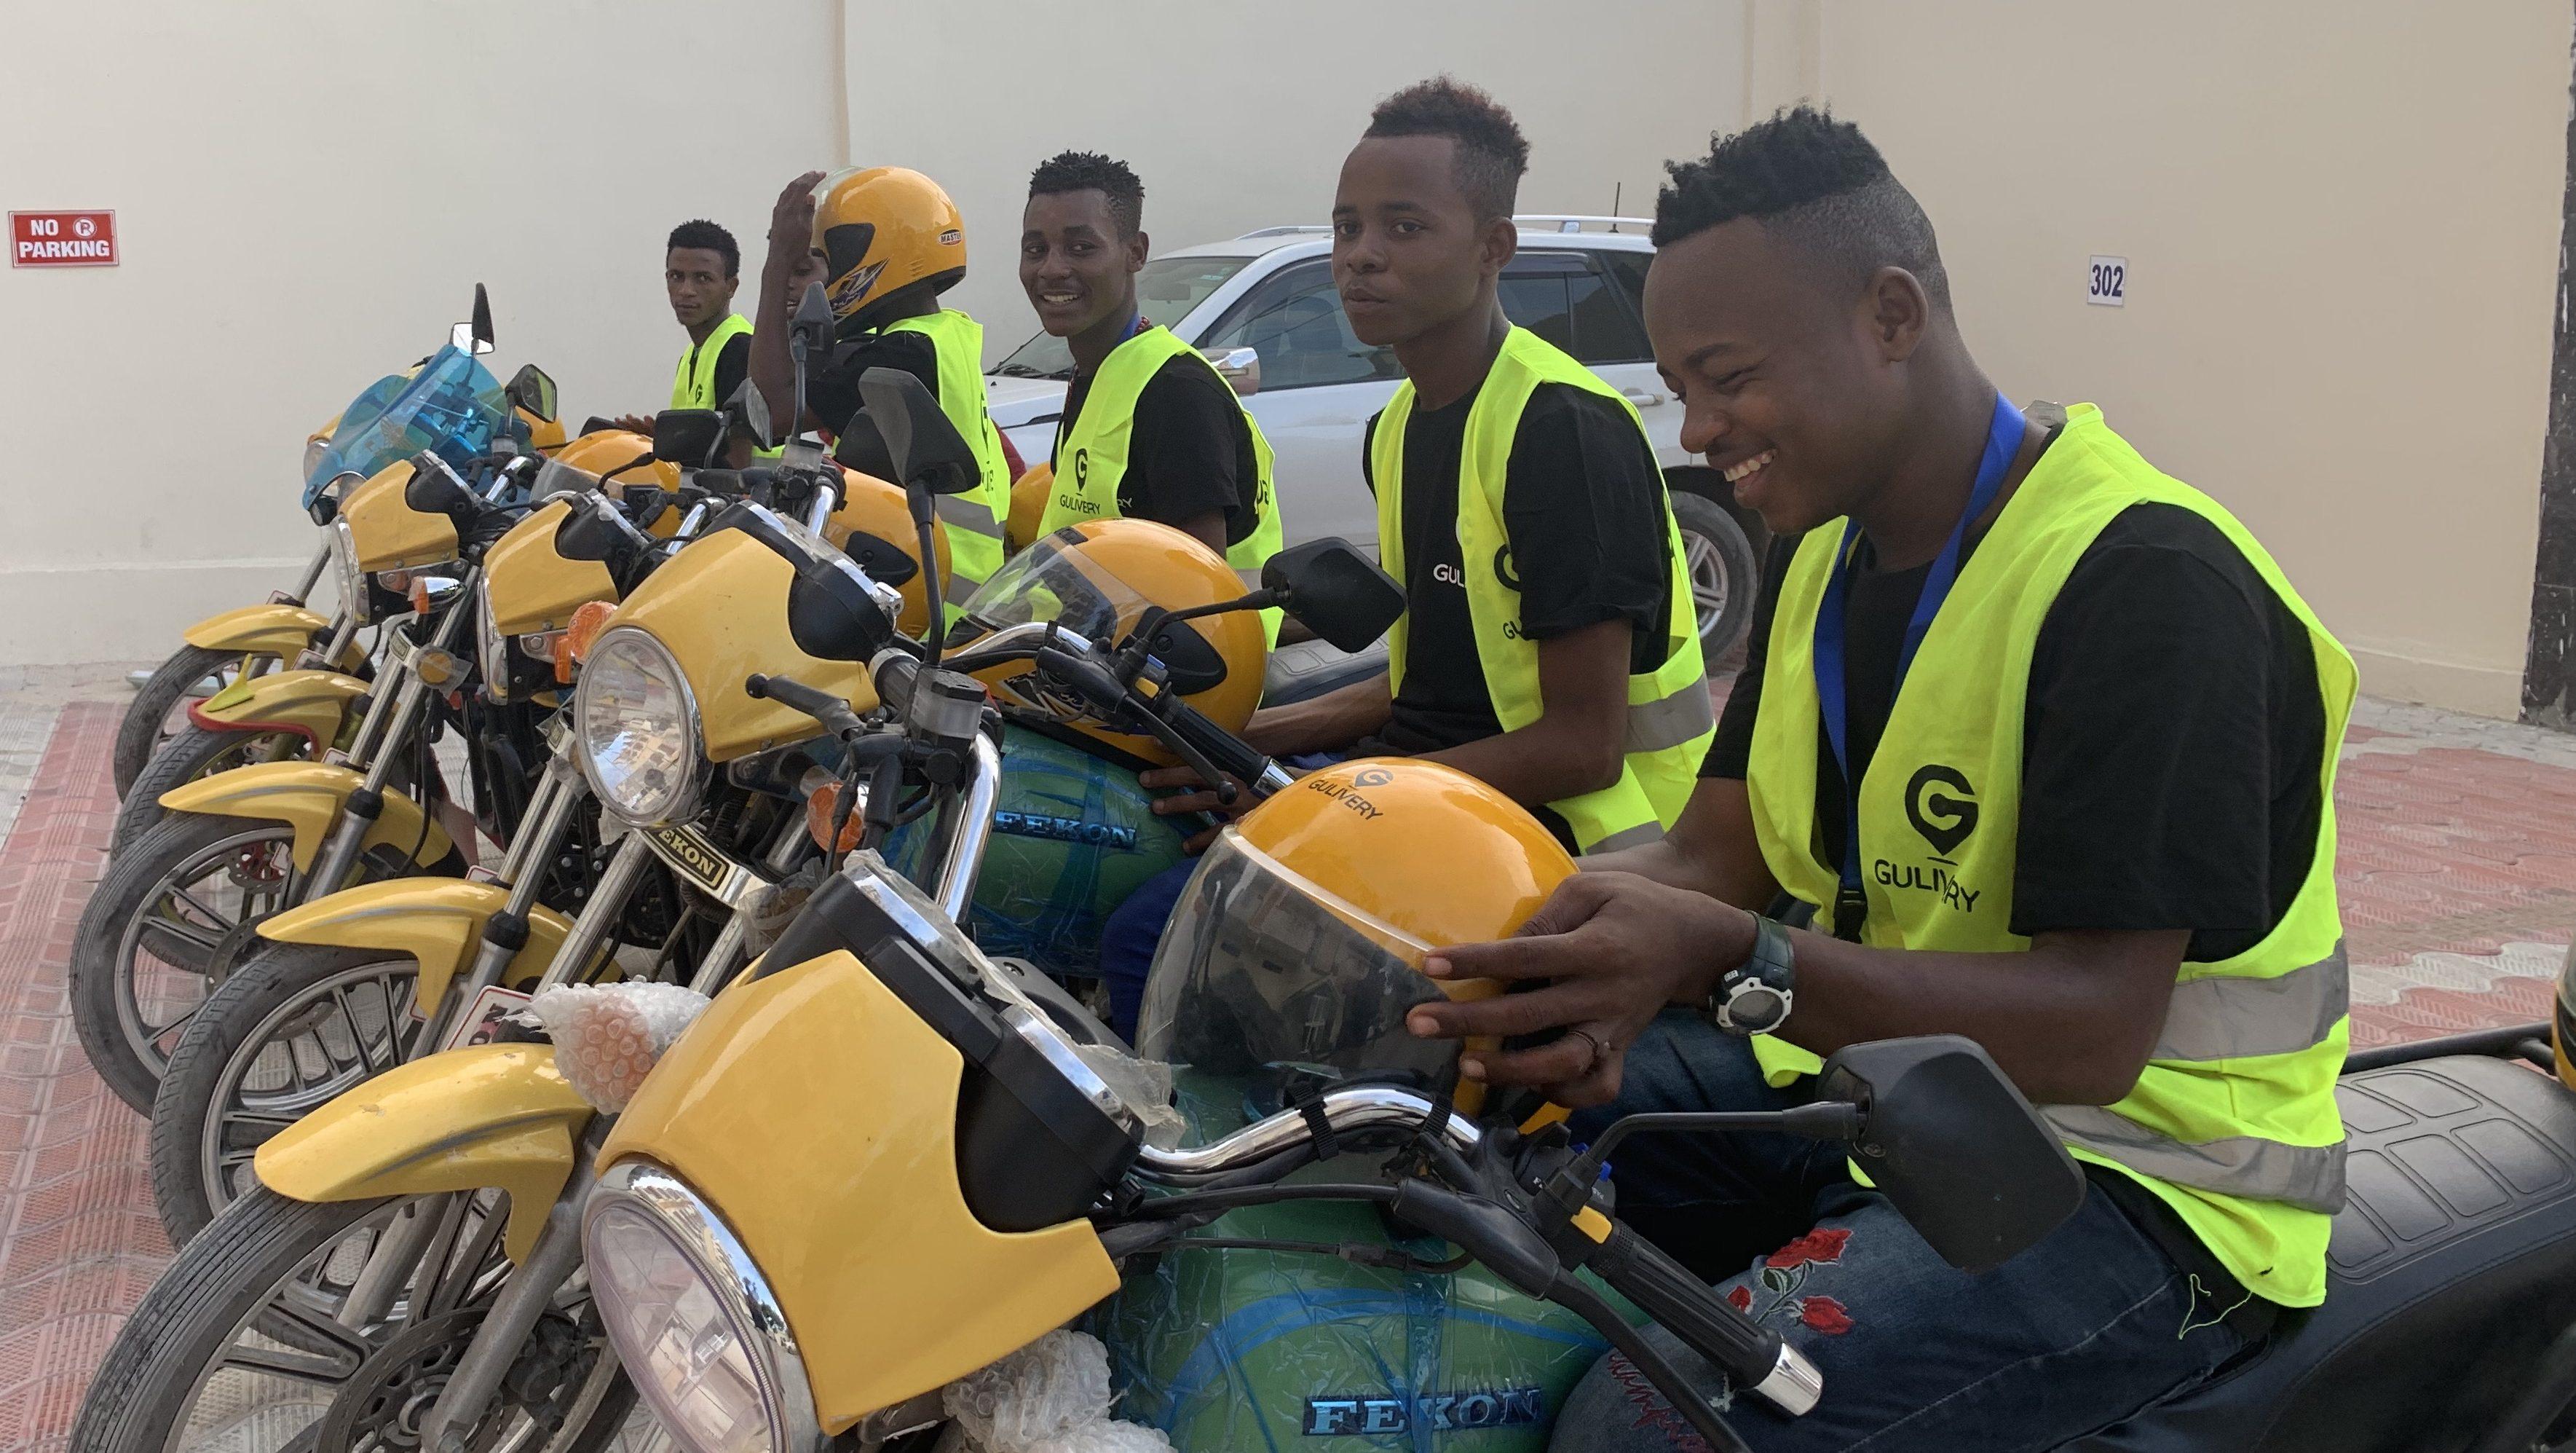 Mogadishu, Somalia moto-hailing app Go!